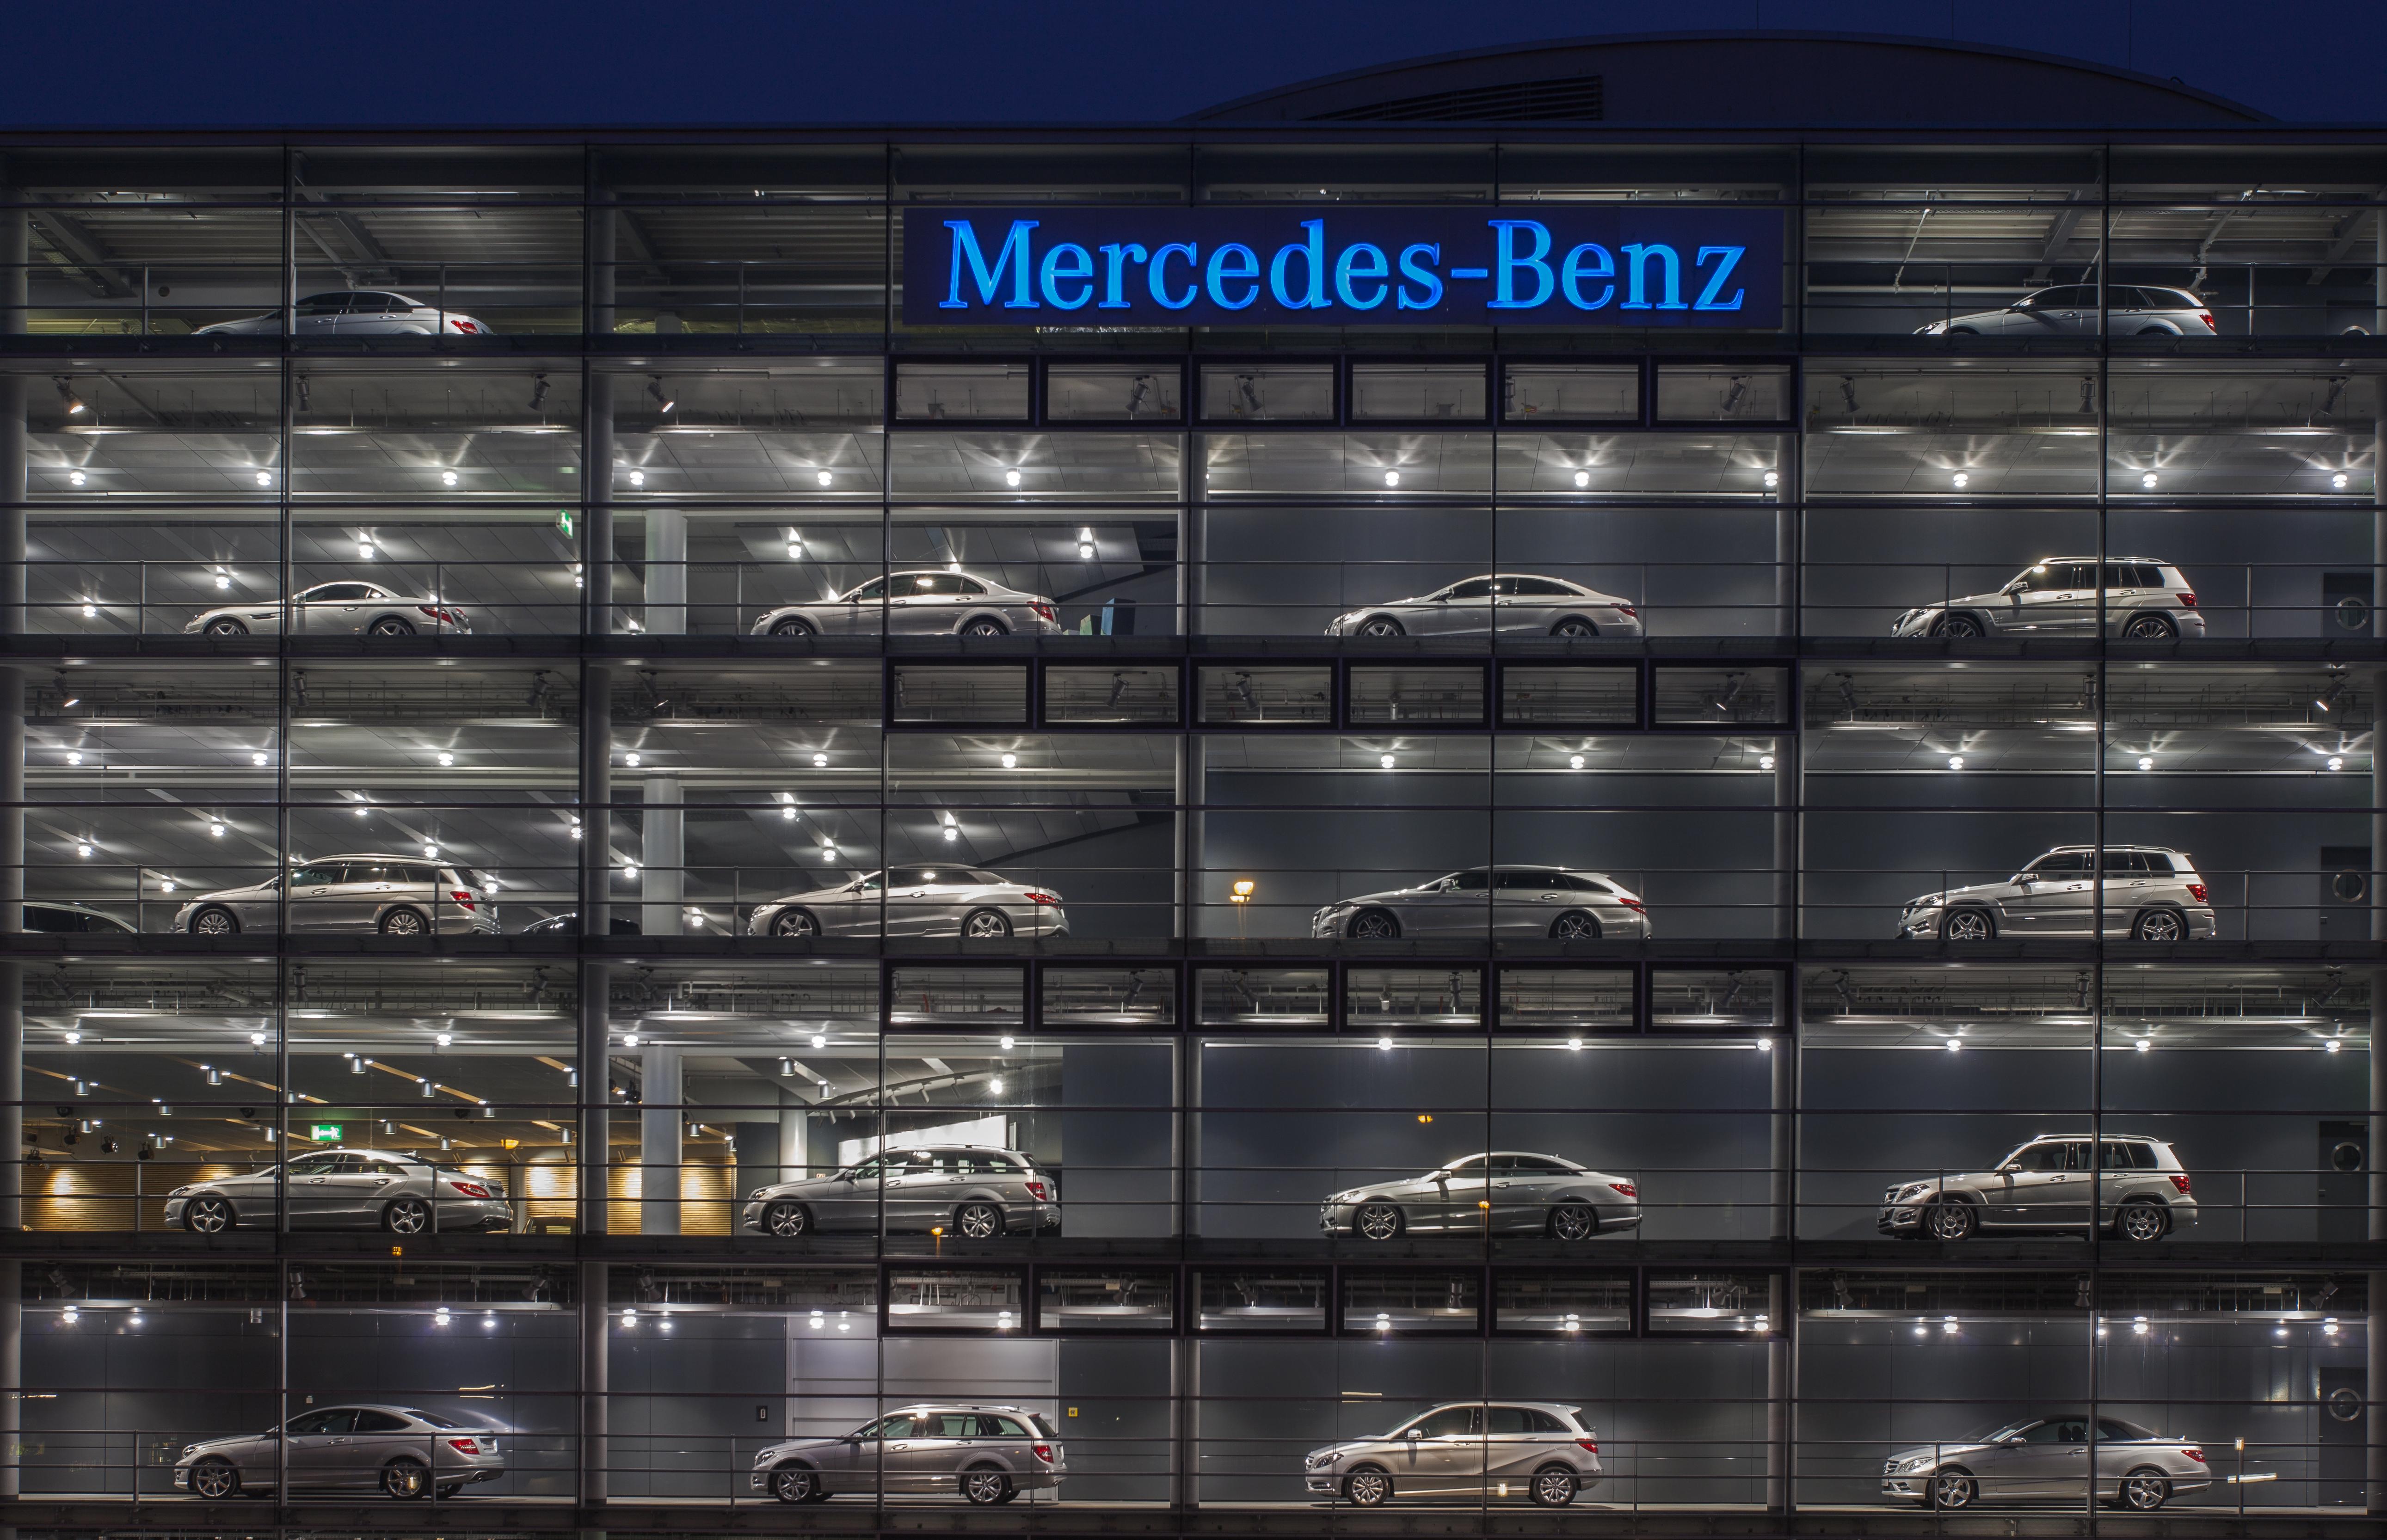 Mercedes Benz Dealership >> File:Concesionario de Mercedes-Benz, Múnich, Alemania ...